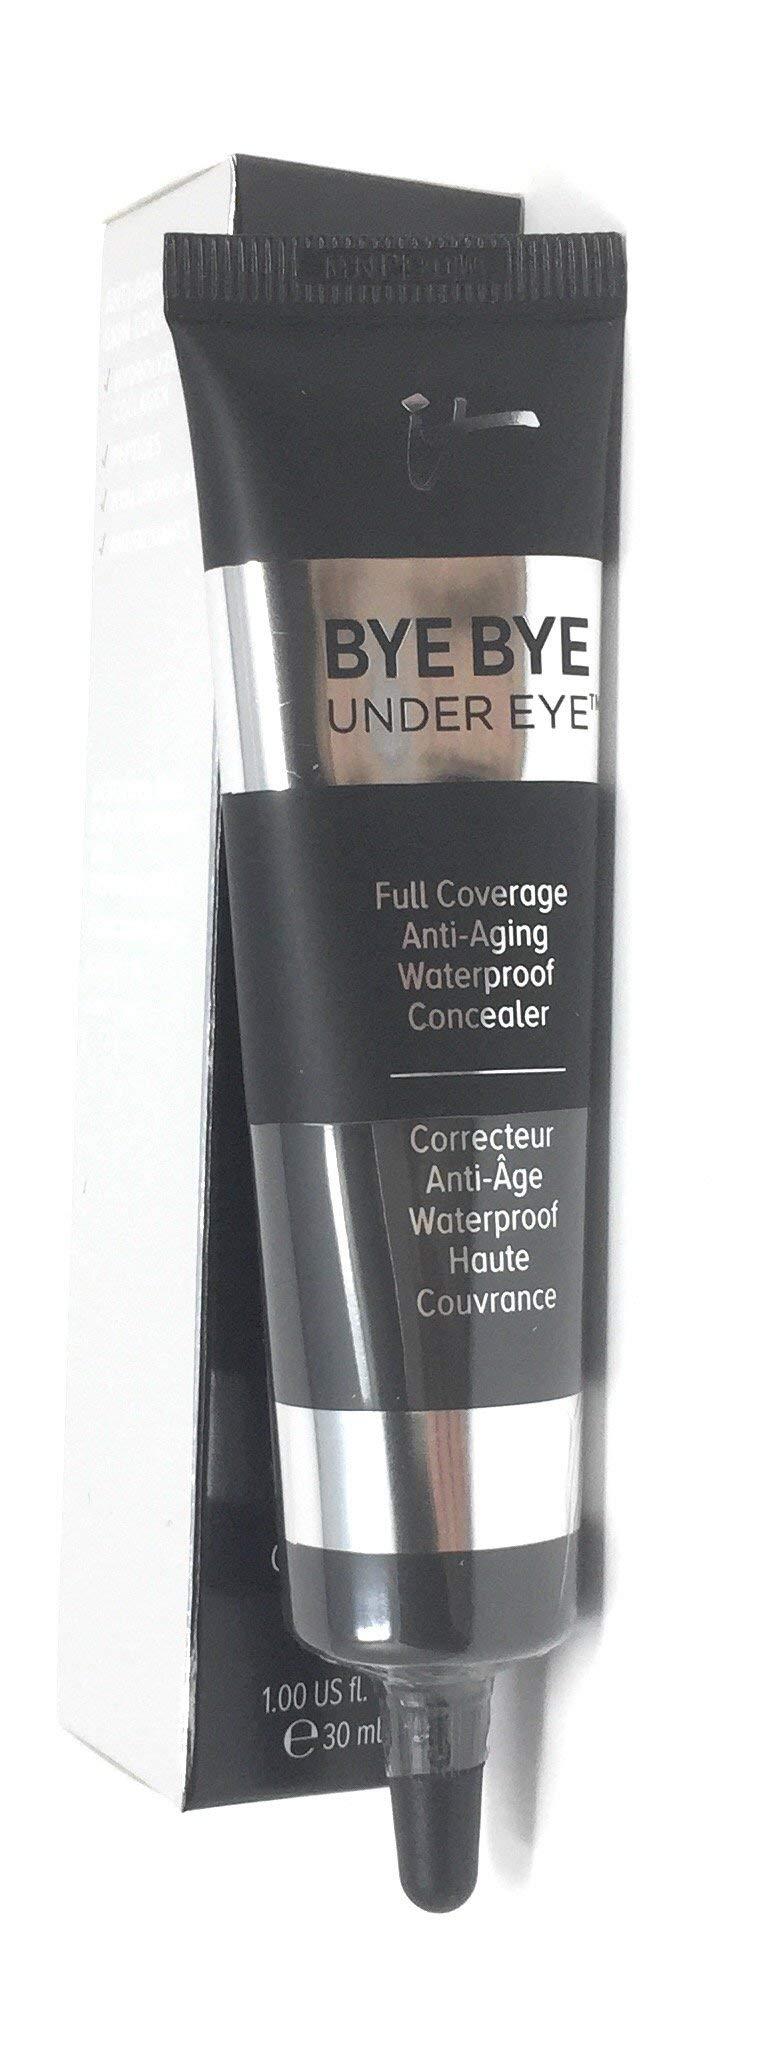 It Cosmetics Bye Bye Under Eye Full Coverage Concealer, Medium Tan by It Cosmetics